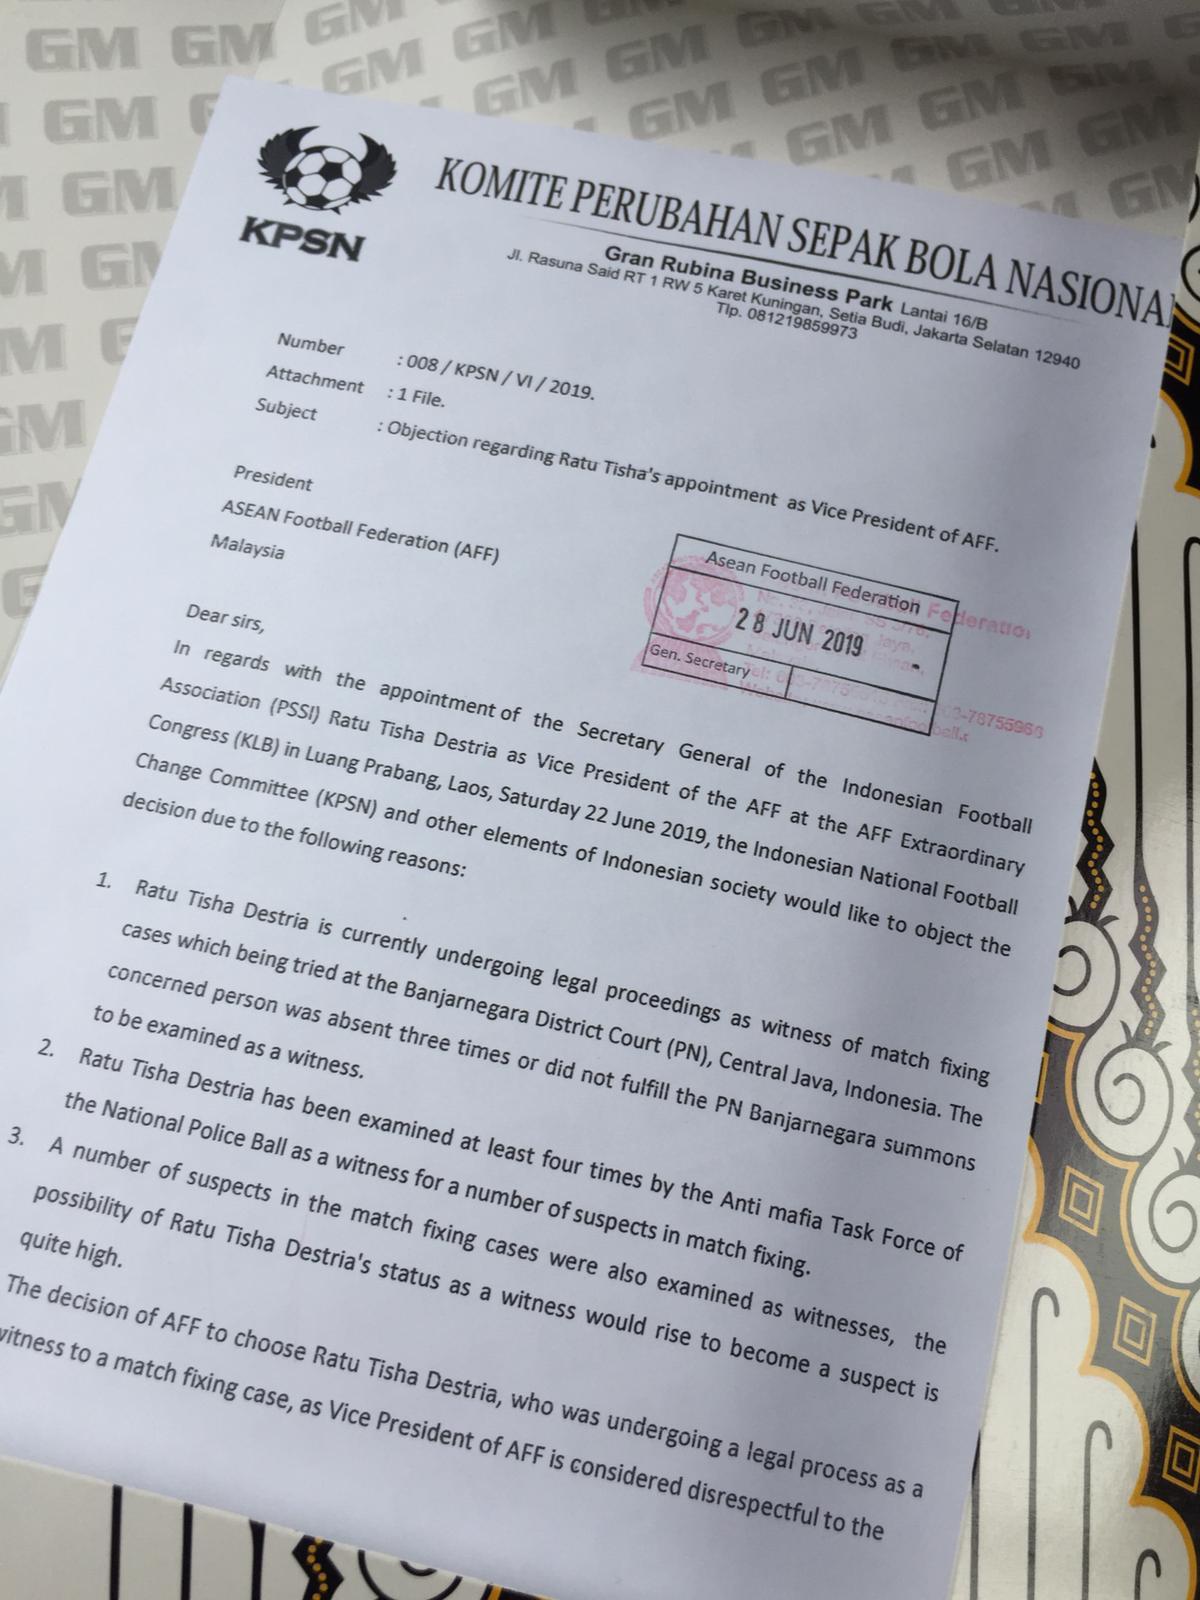 Kpsn Kirim Surat Resmi Ke Aff Tribunnewscom